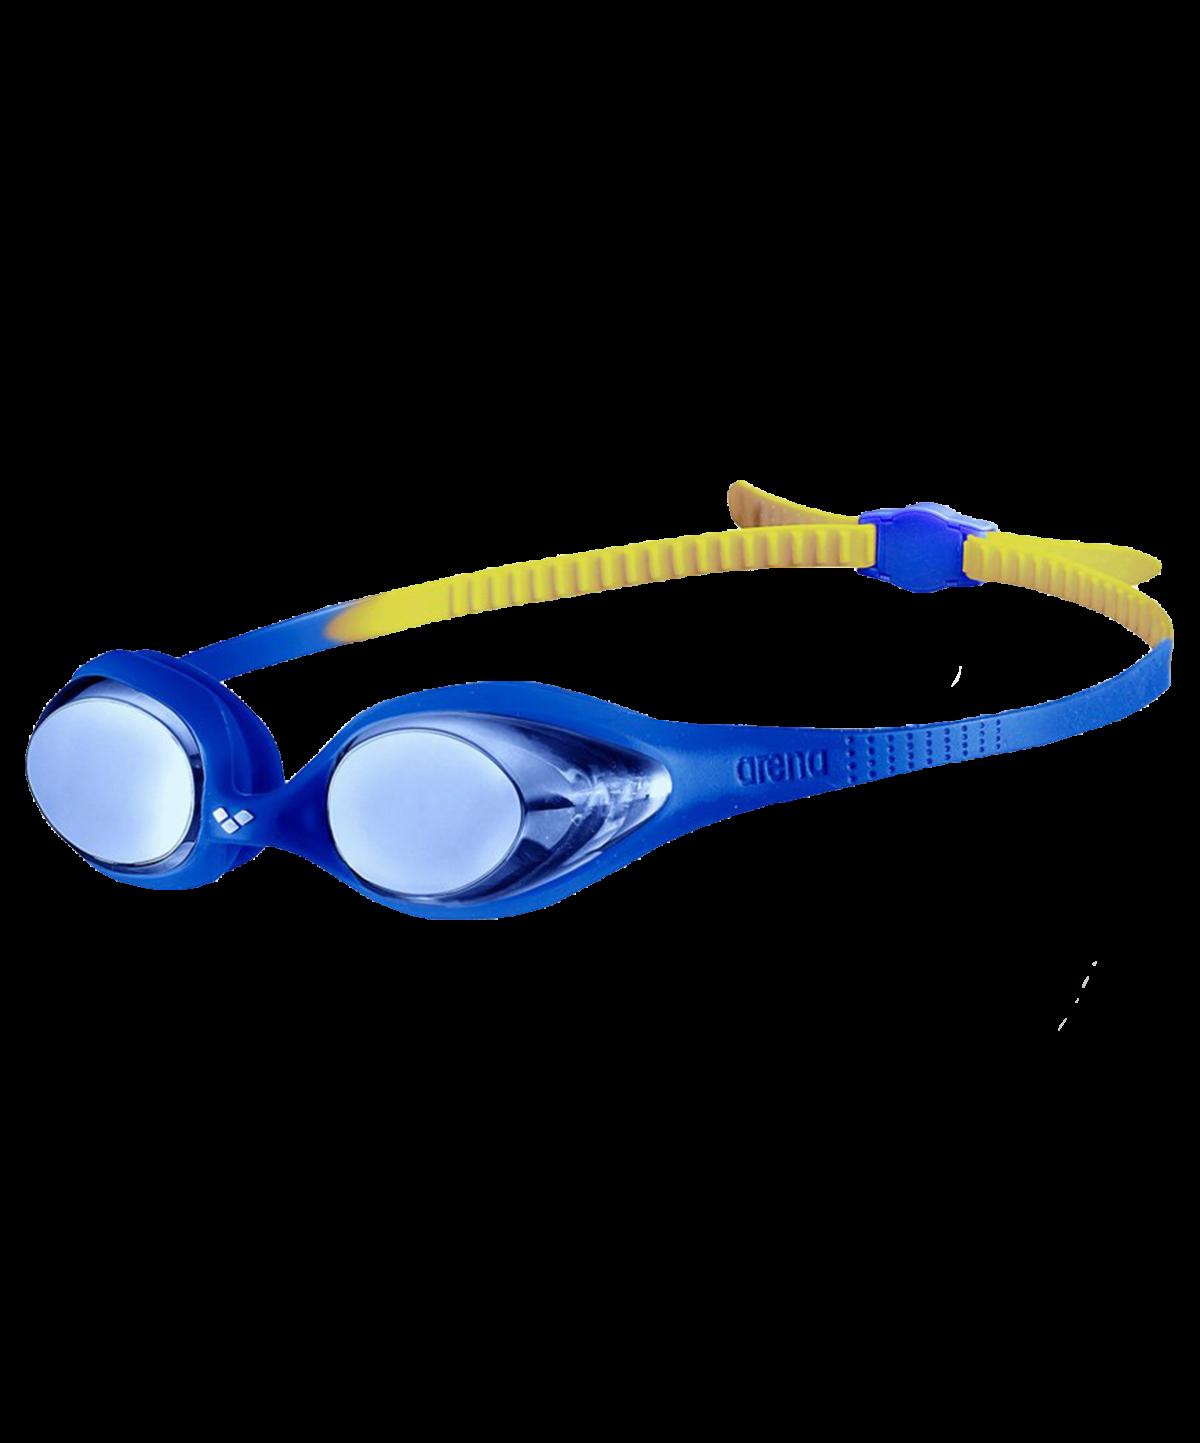 ARENA Очки для плавания детские  1Е36273 - 1